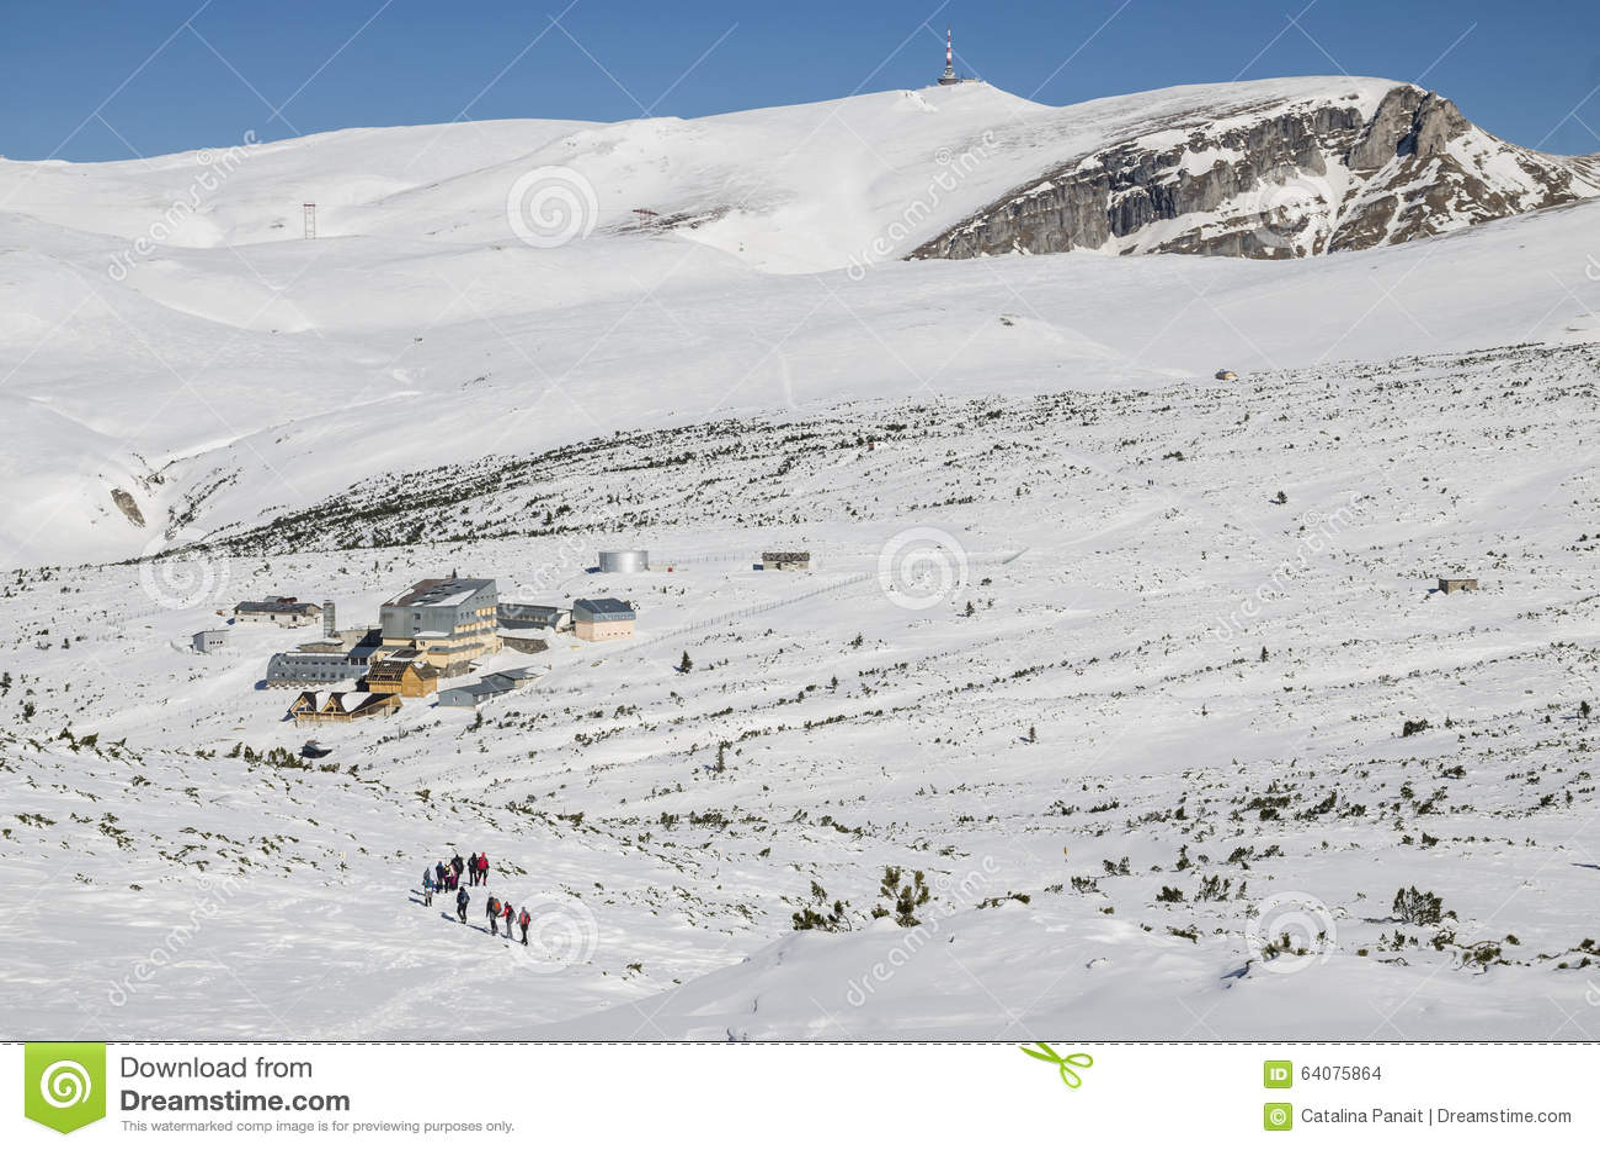 towards the snowy - photo #26